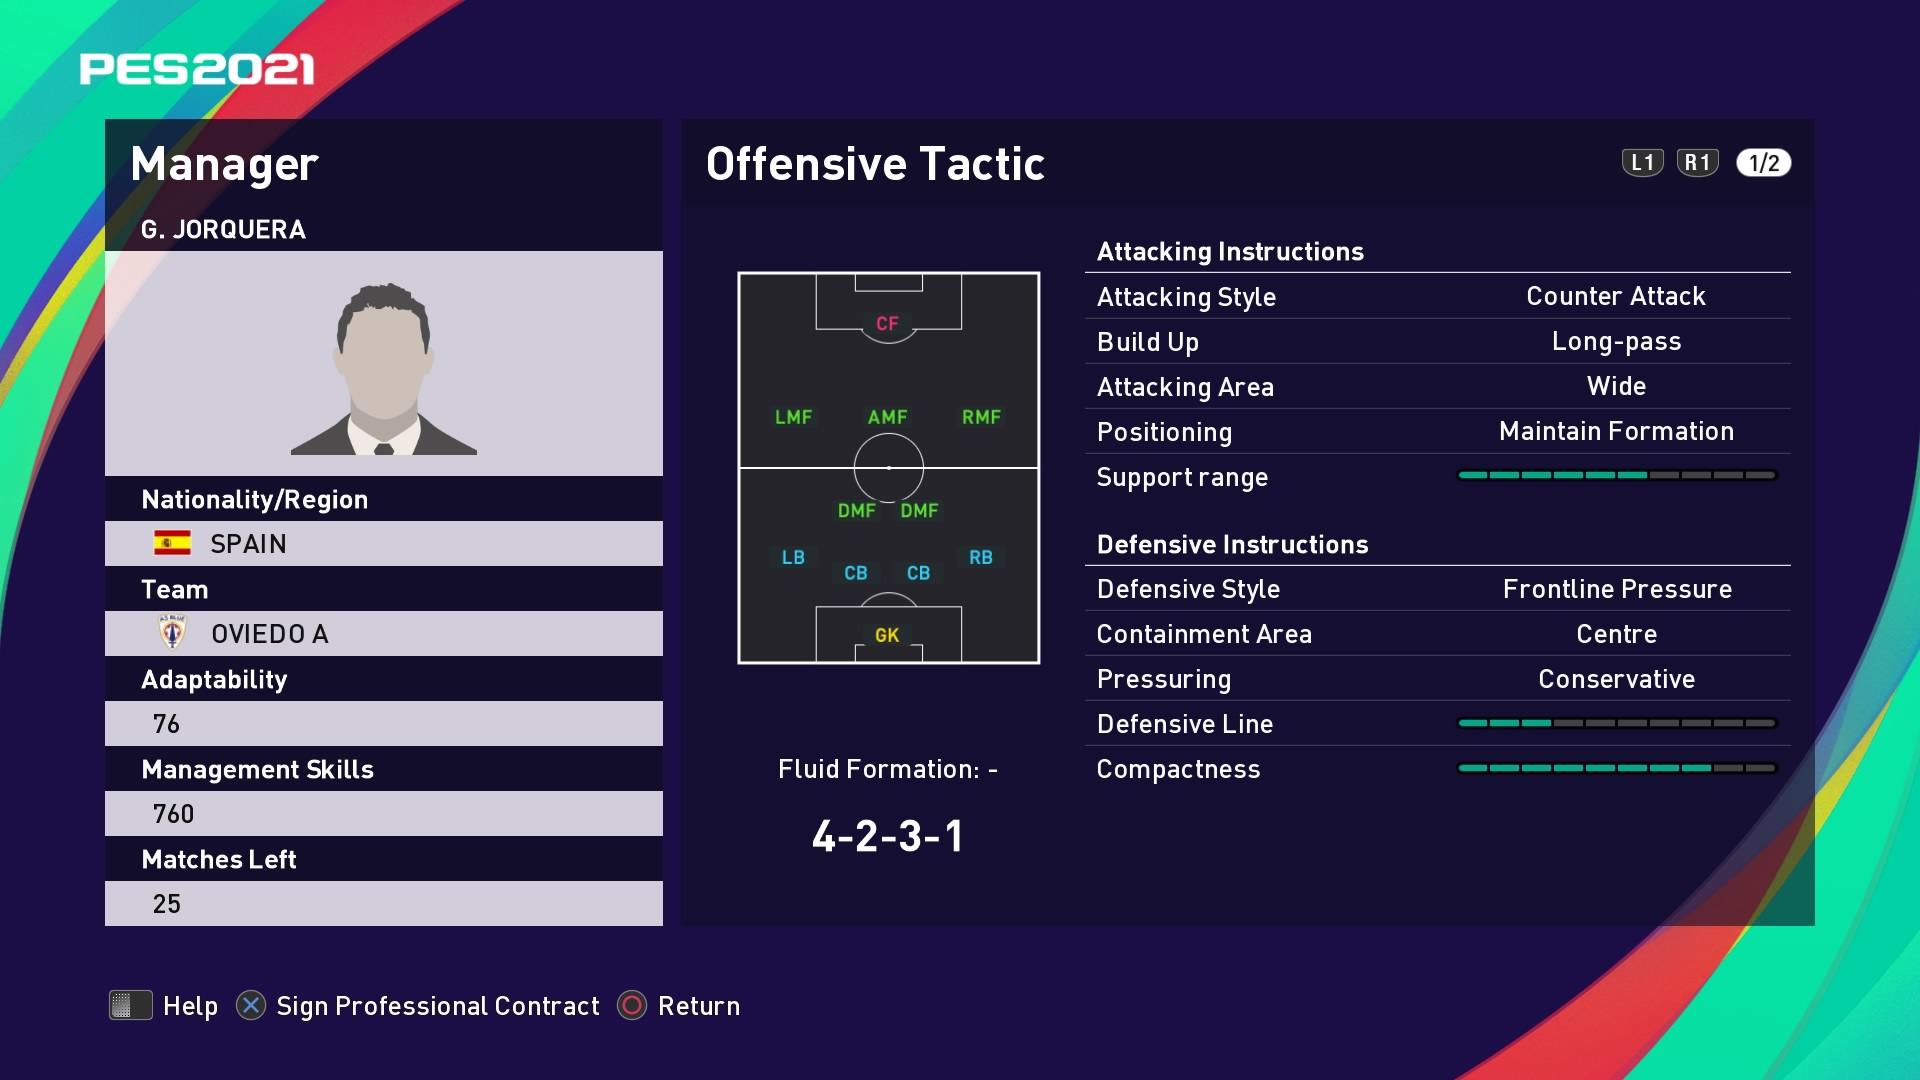 G. Jorquera (José Ángel Ziganda) Offensive Tactic in PES 2021 myClub